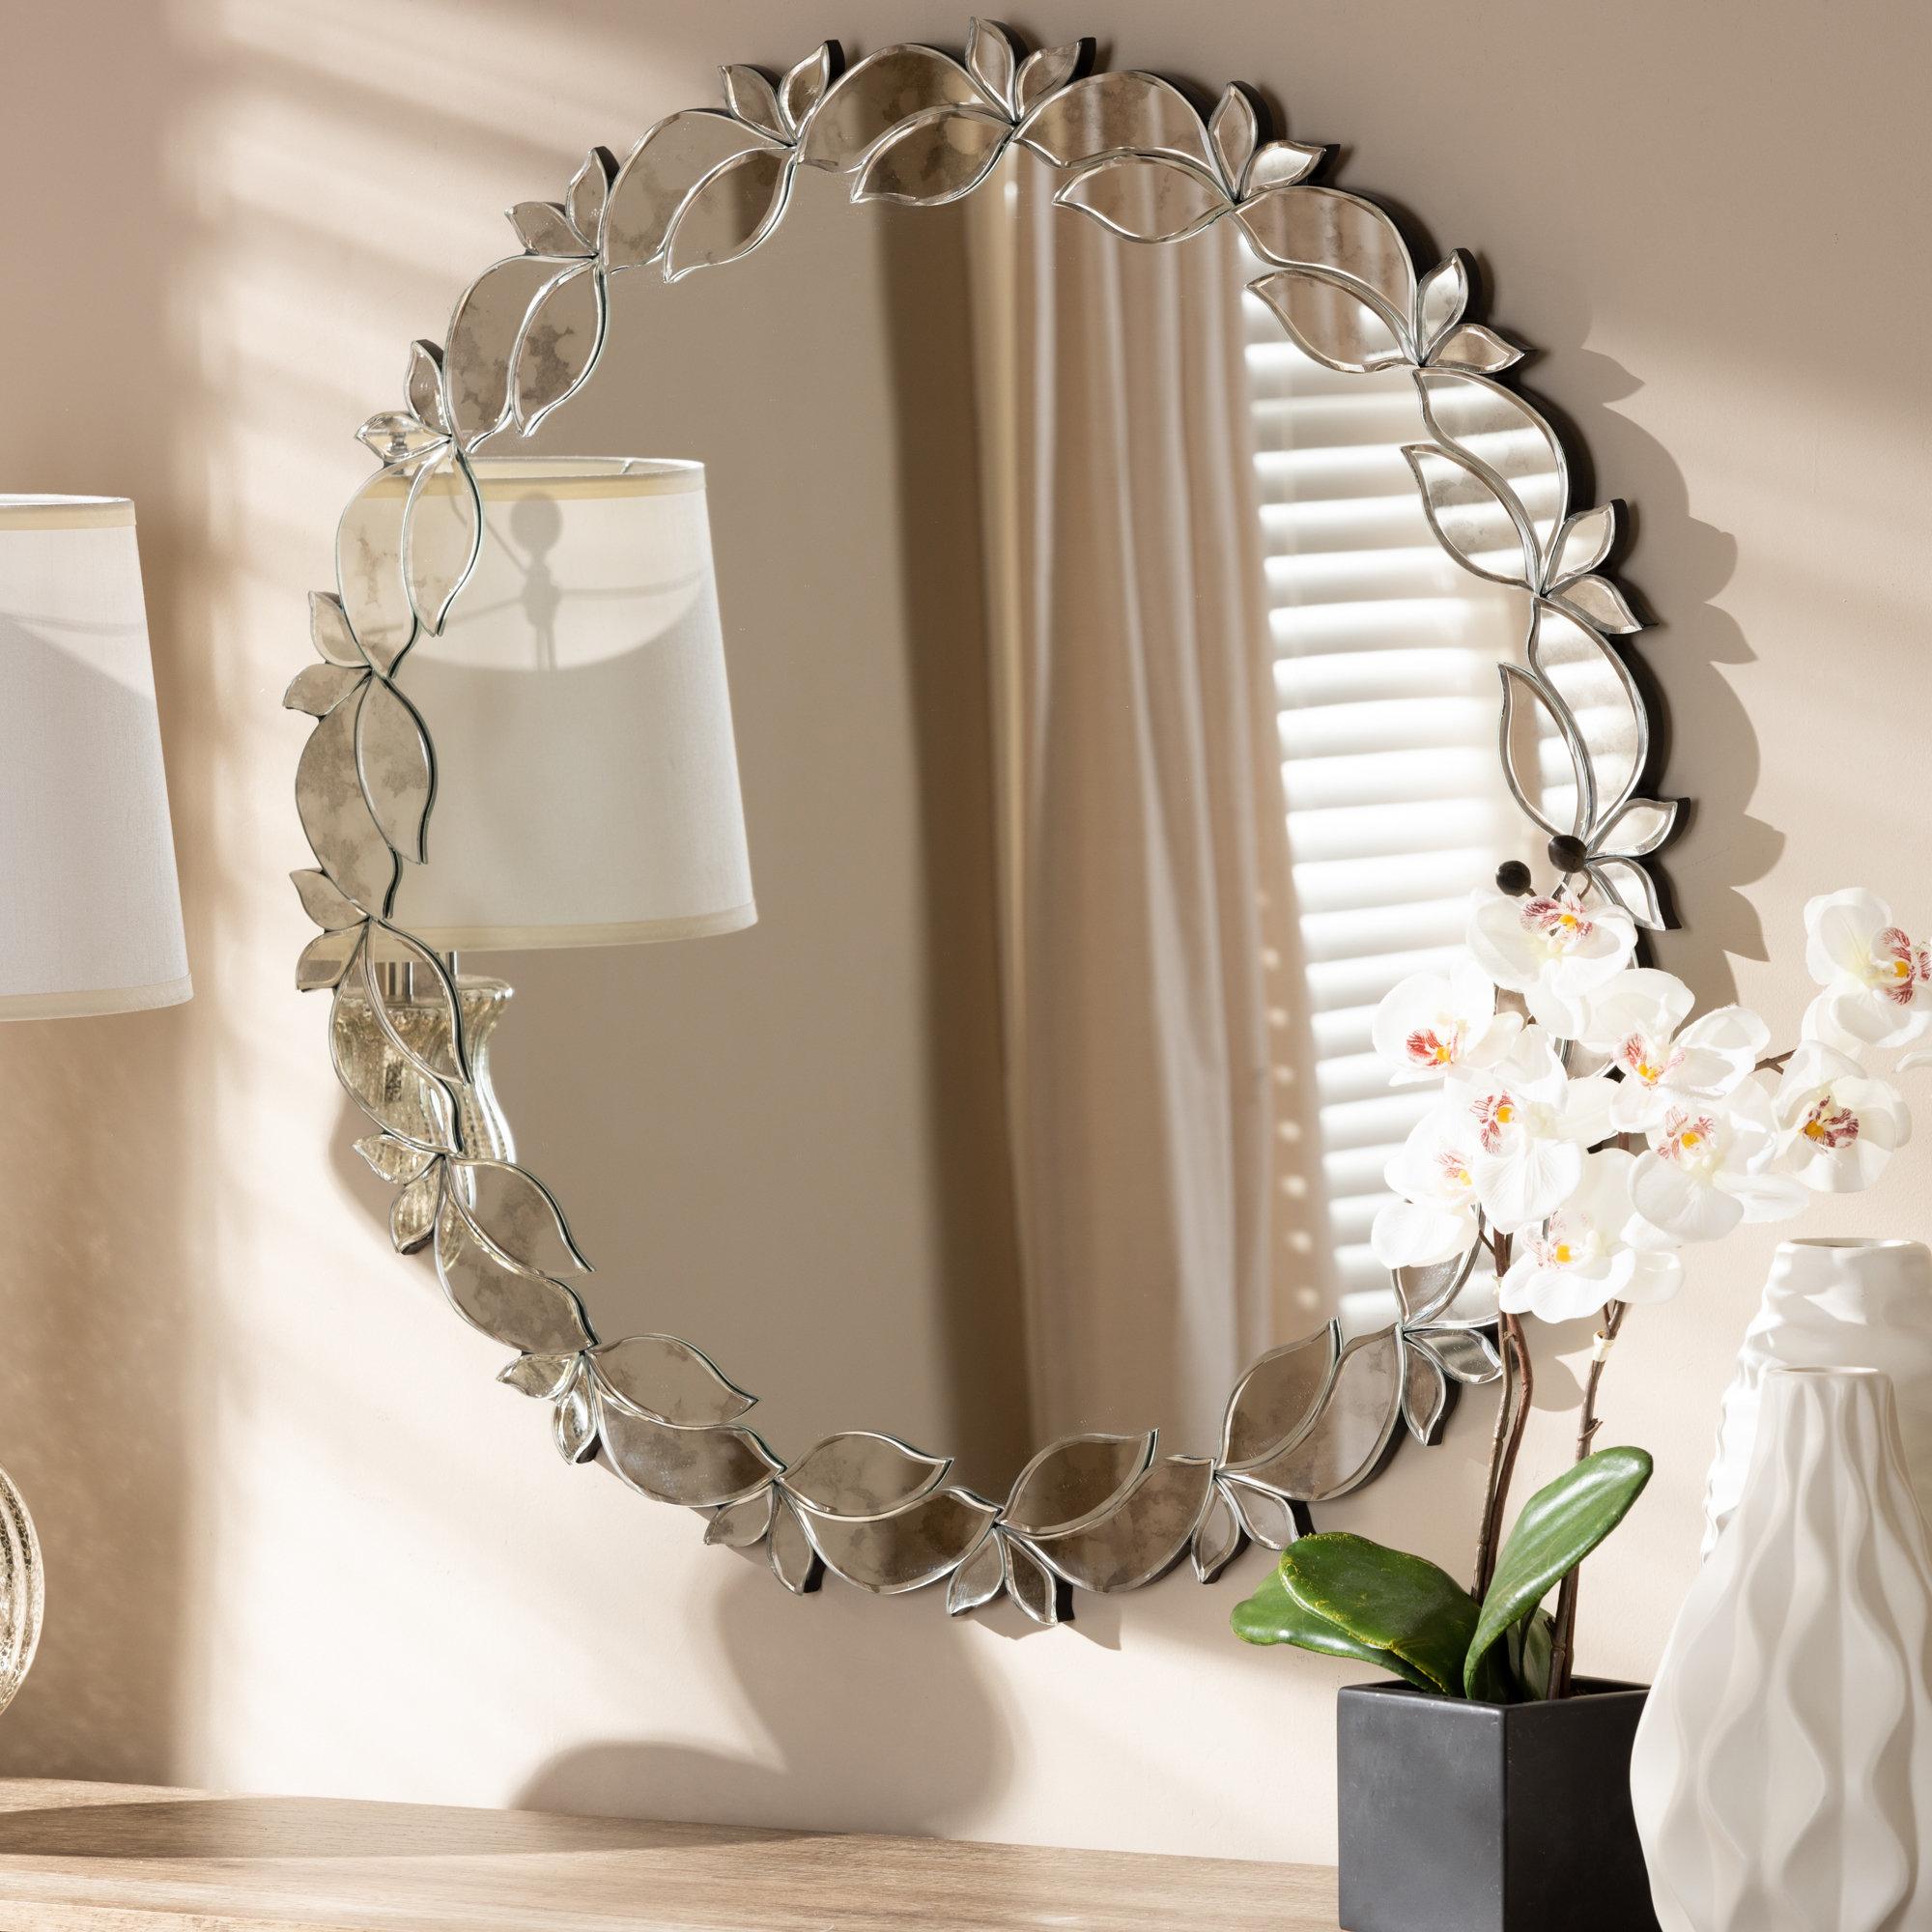 2020 Bem Decorative Wall Mirrors Regarding Isom Modern & Contemporary Wall Mirror (View 6 of 20)